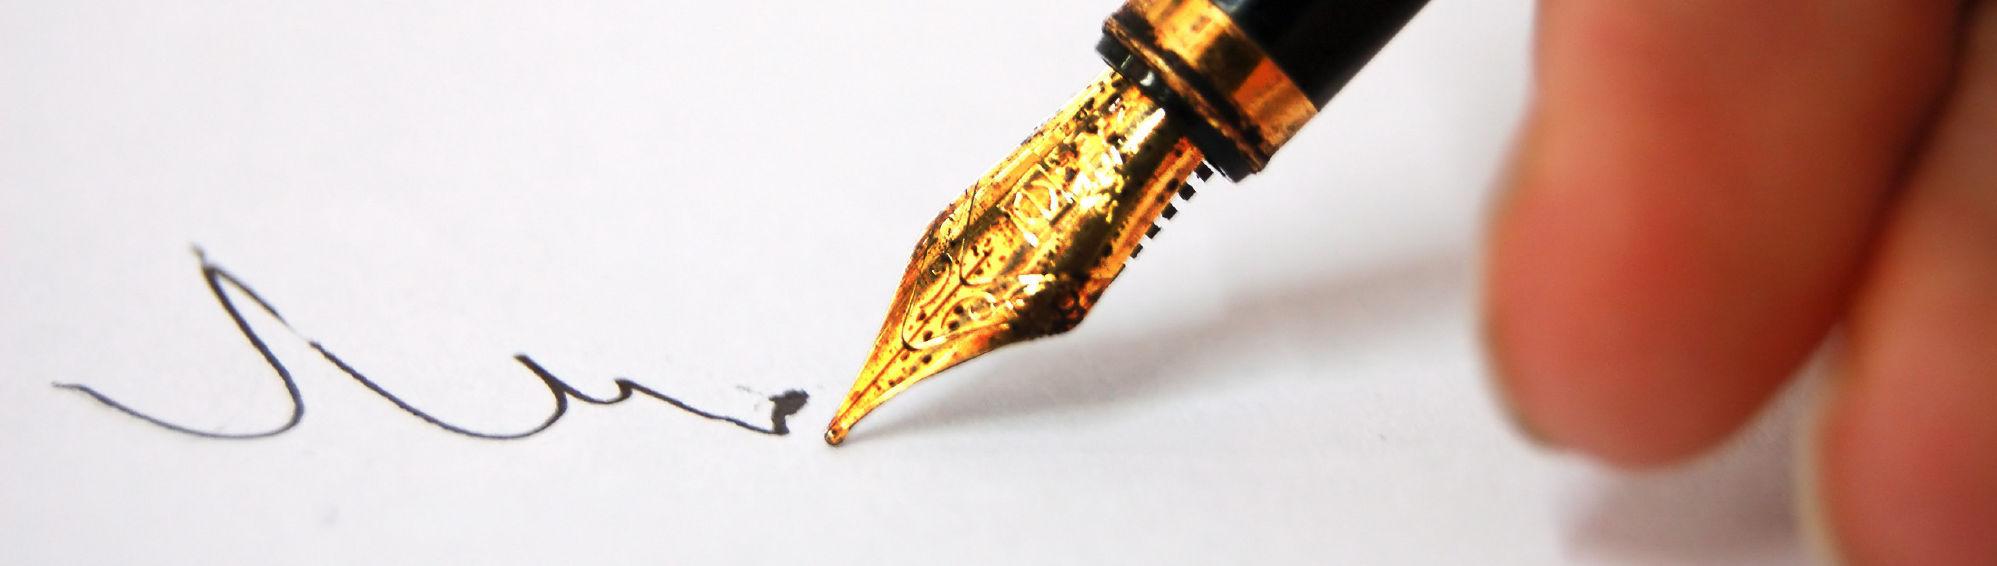 thoughtful-pen-writing-24581037-2560-1702 cropped 2560x726